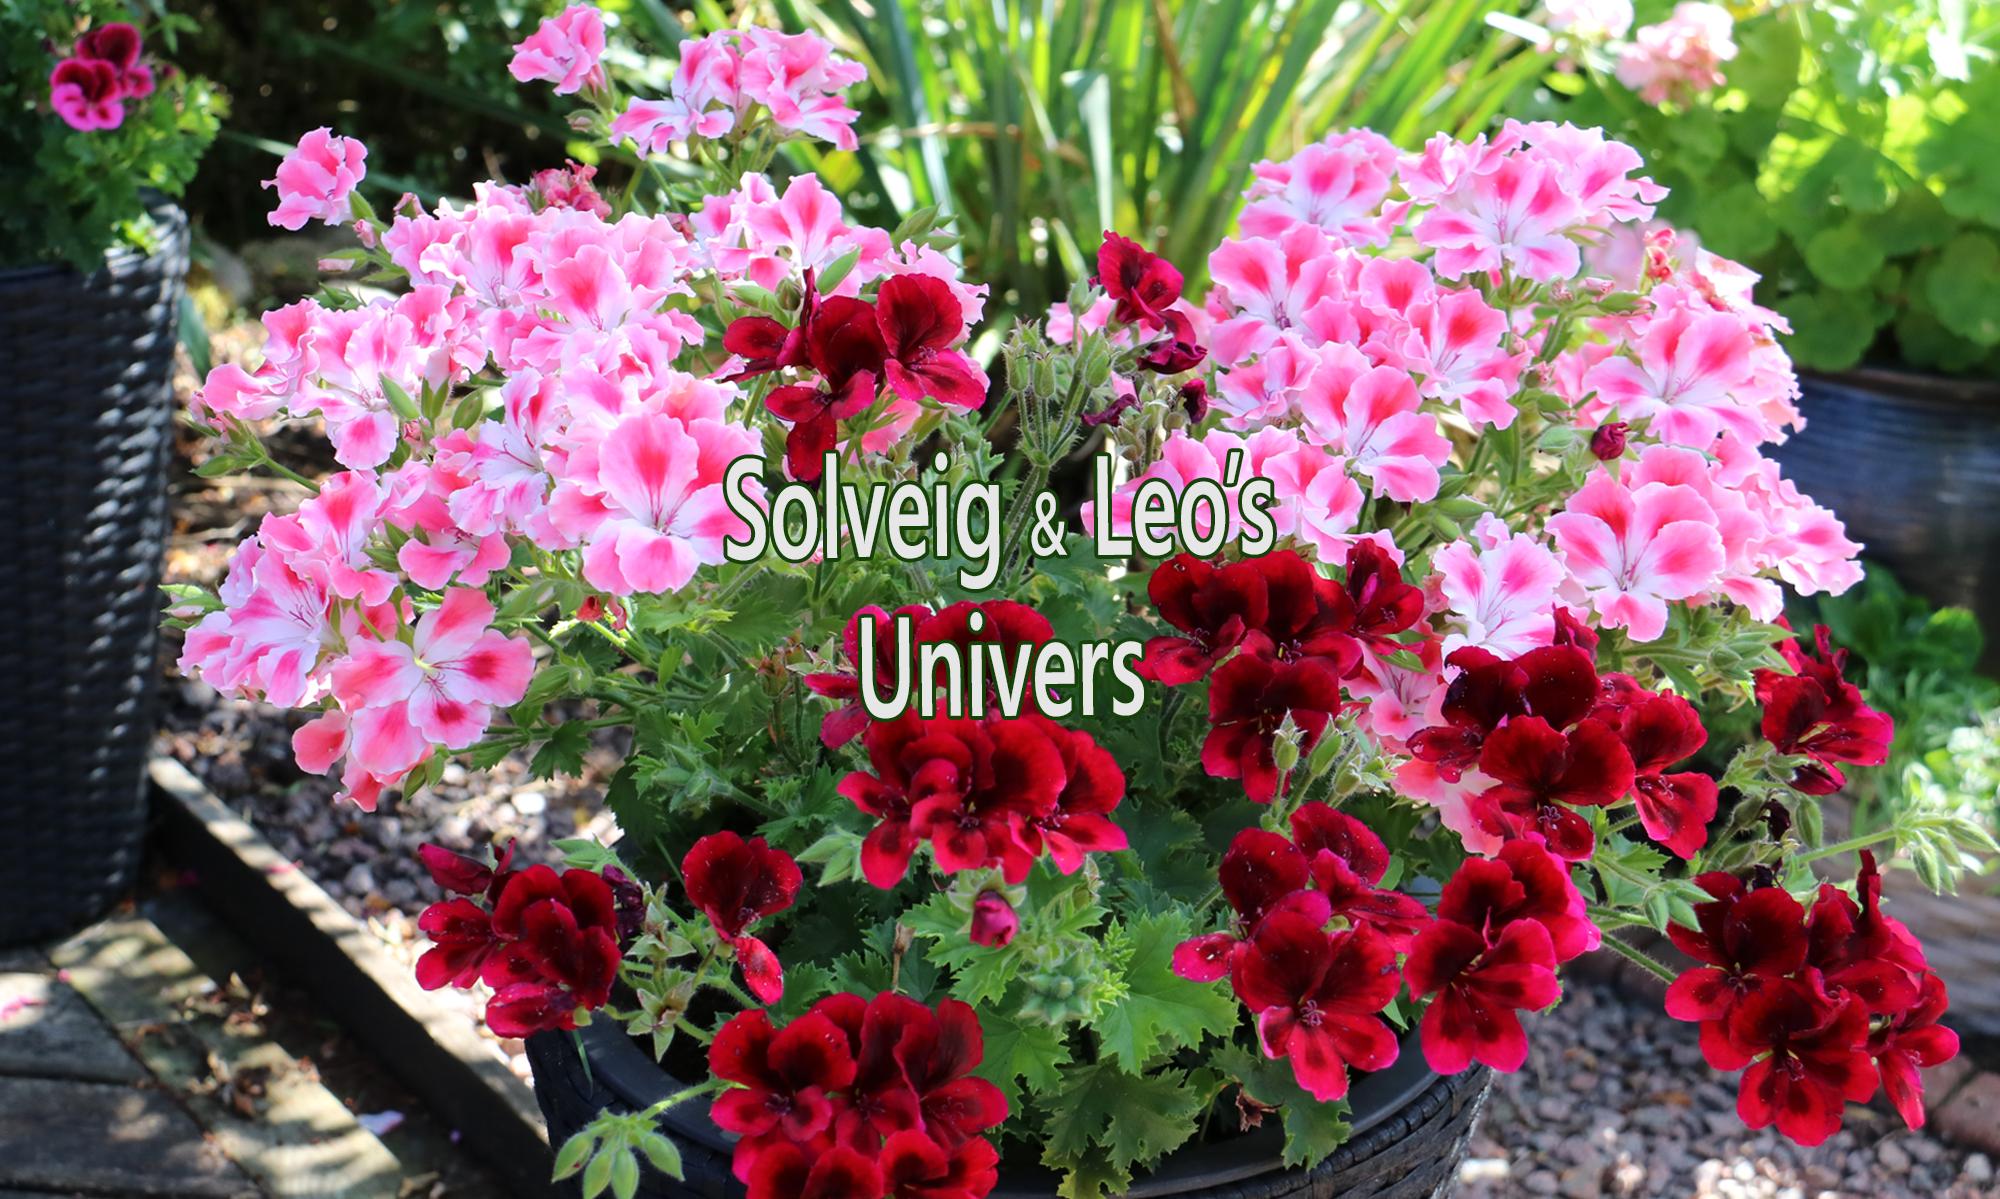 Solveig & Leos Univers